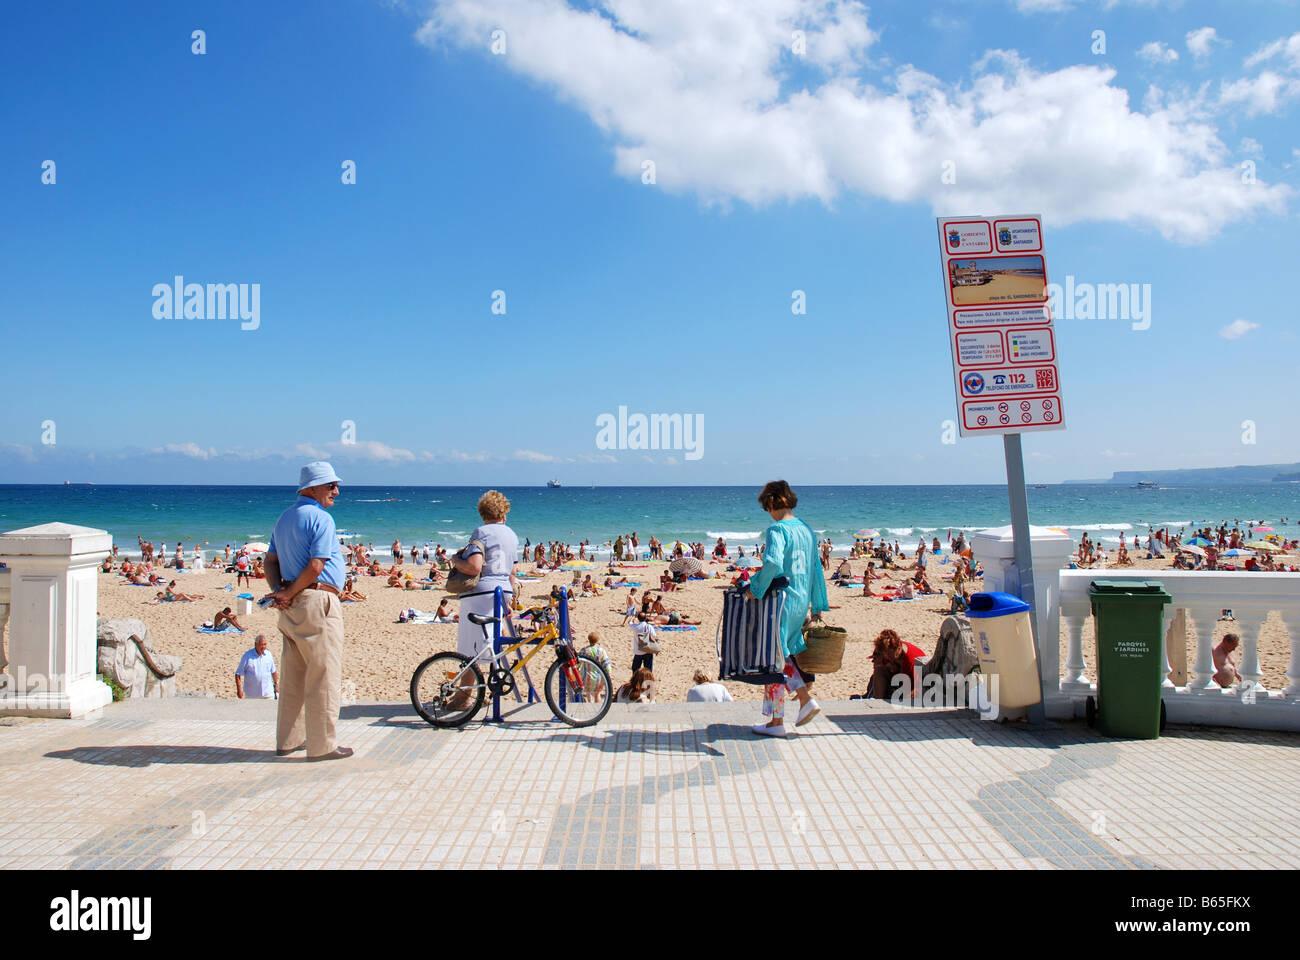 People on El Sardinero beach. Santander. Cantabria province. Spain. - Stock Image